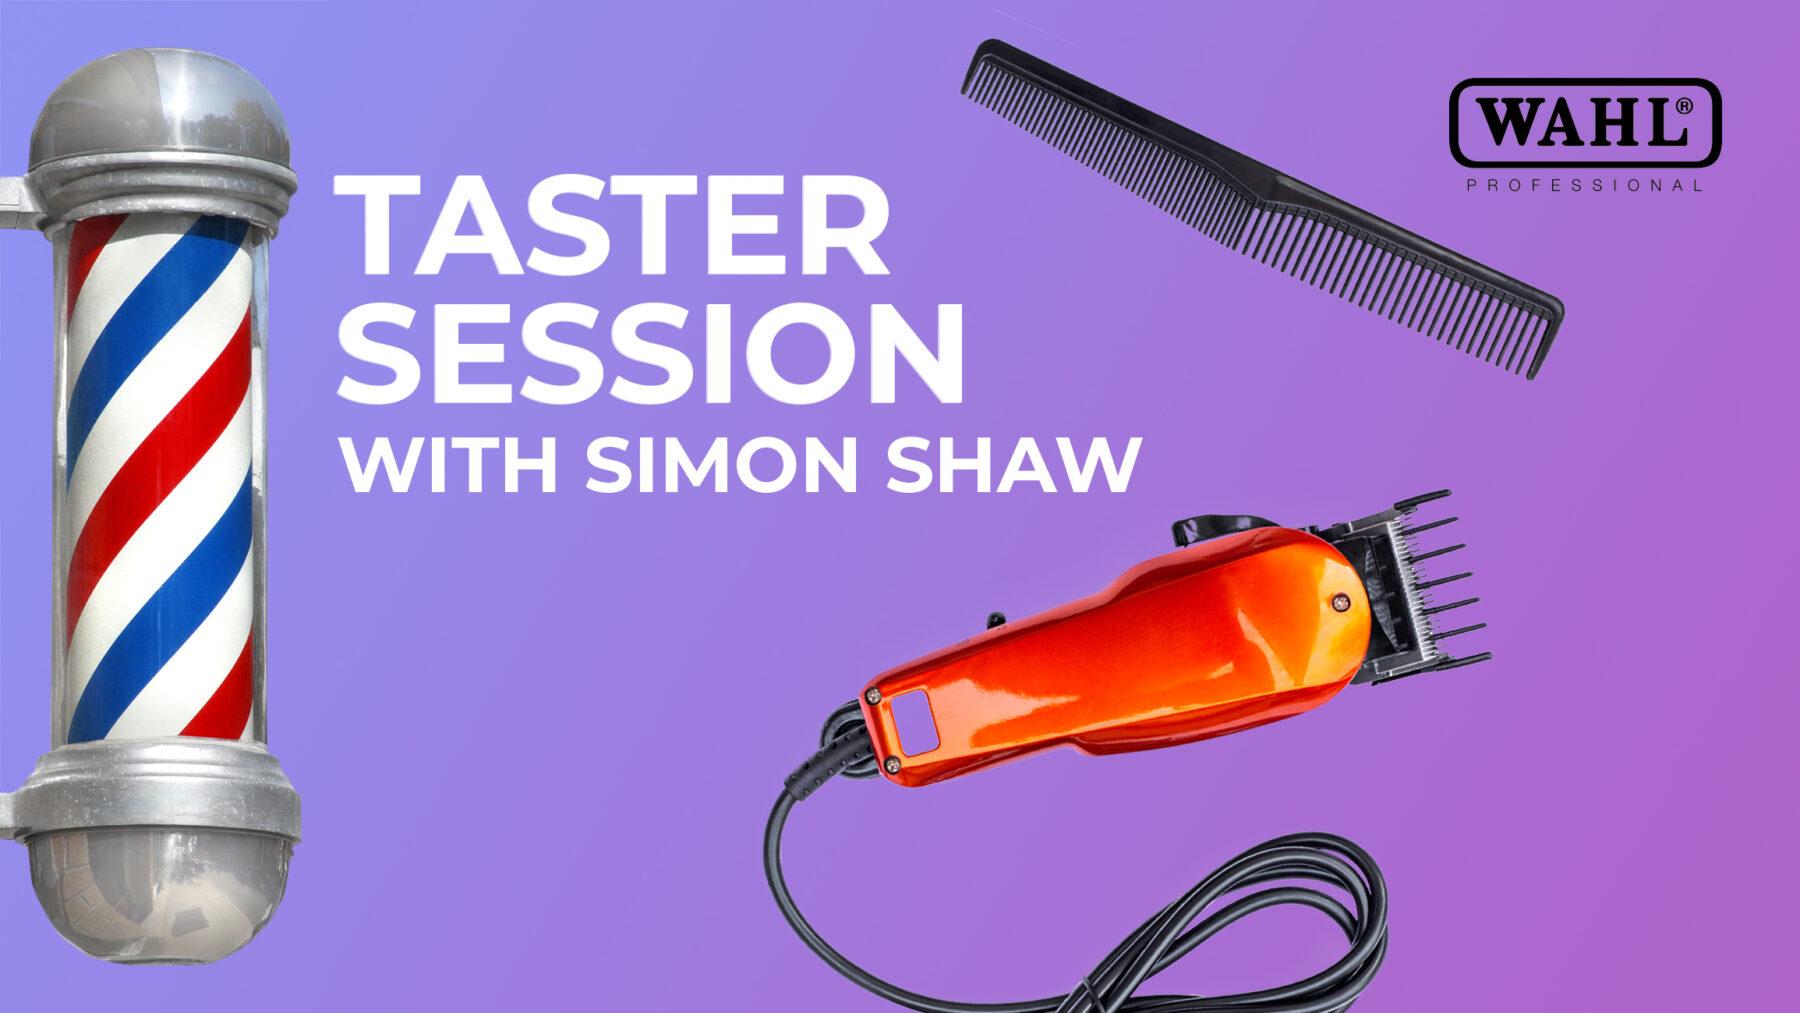 Simon Shaw Taster Session